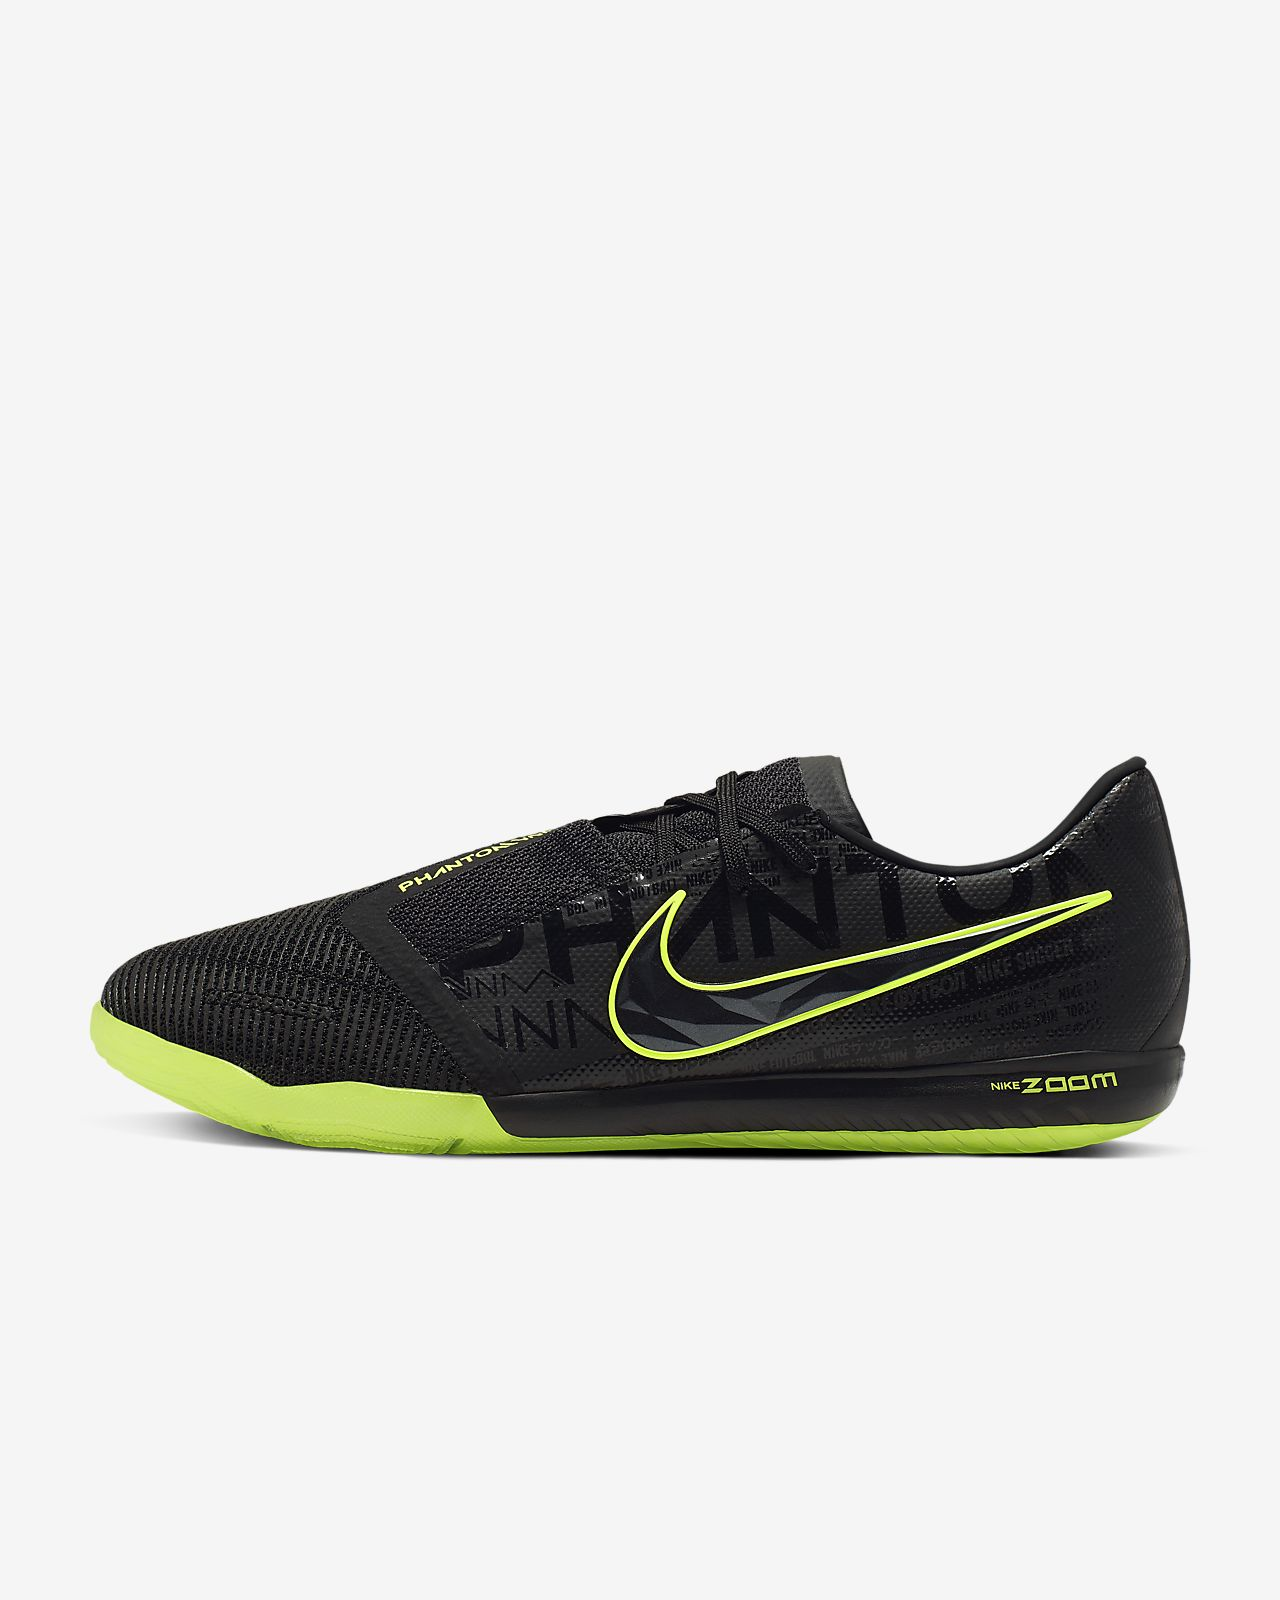 Chaussure de football en salle Nike Zoom Phantom Venom Pro IC